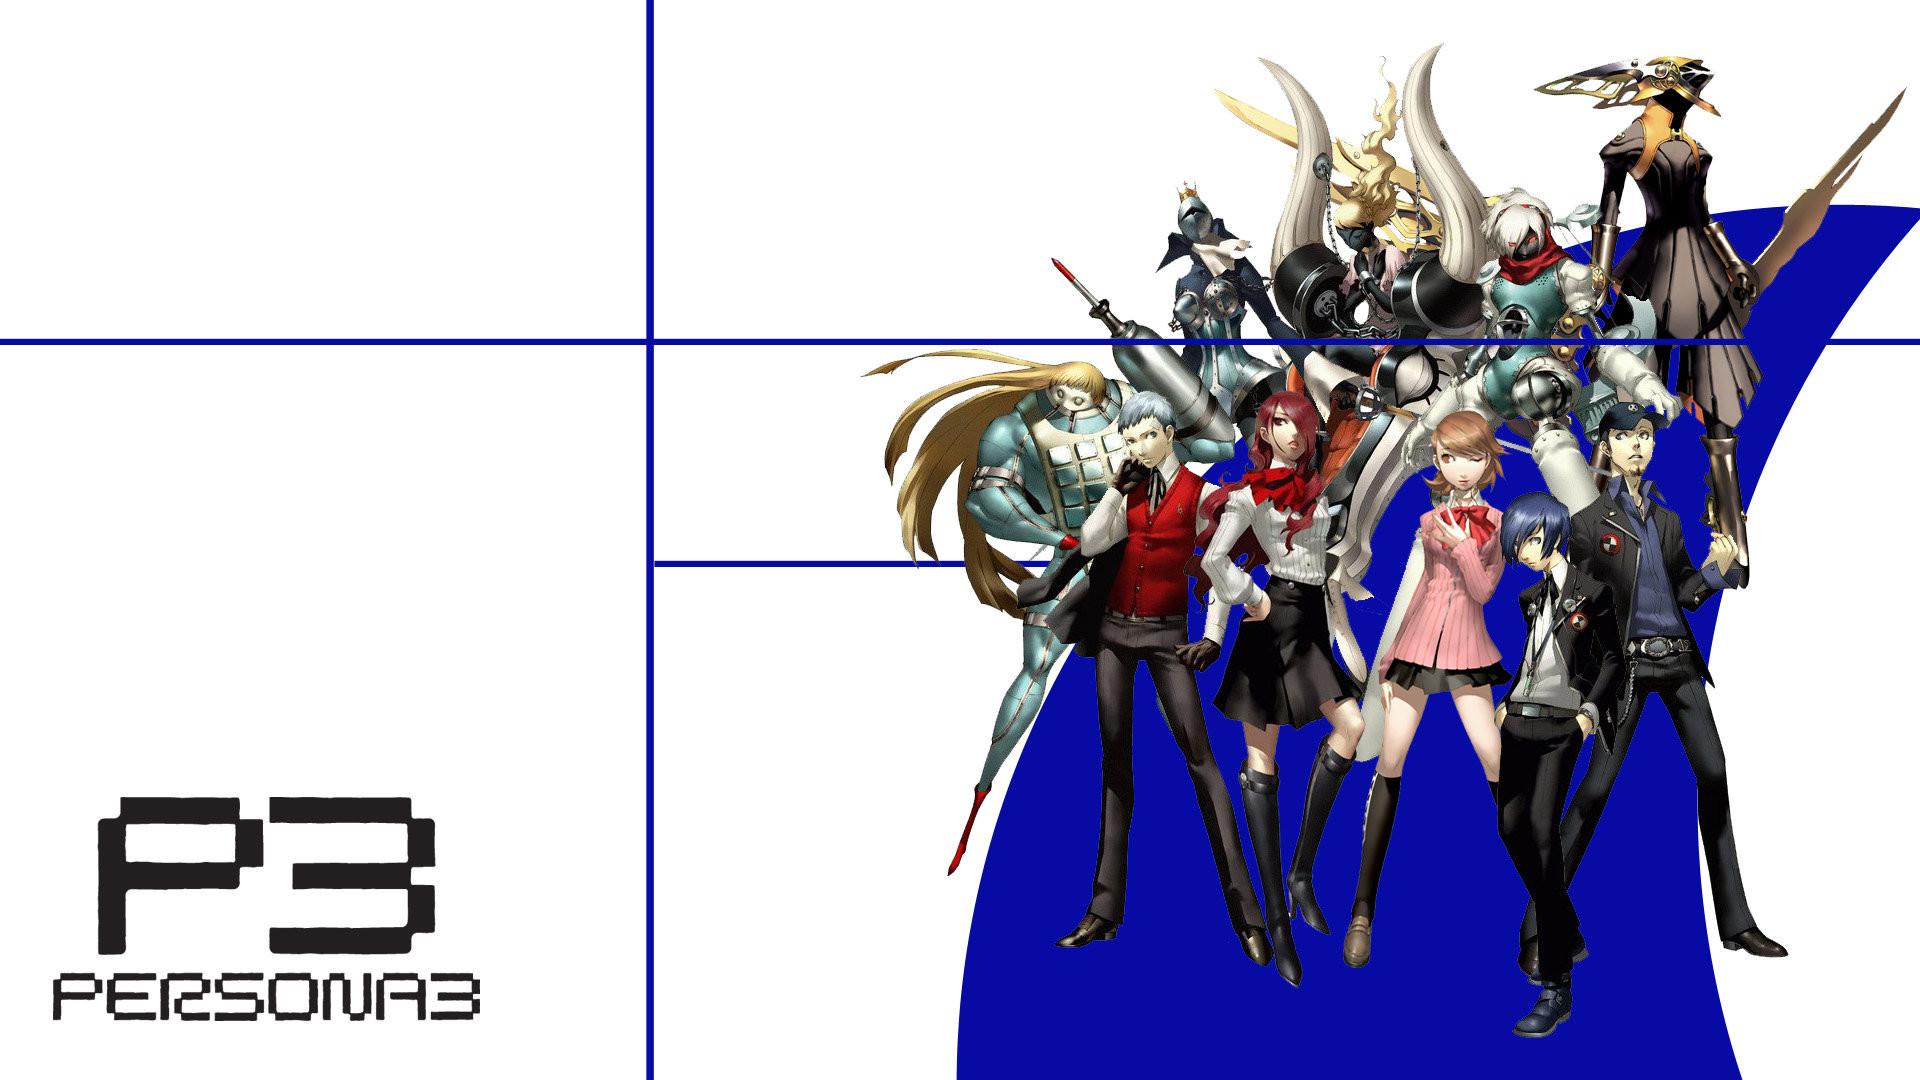 Persona 3 Hd Wallpaper 68 Images